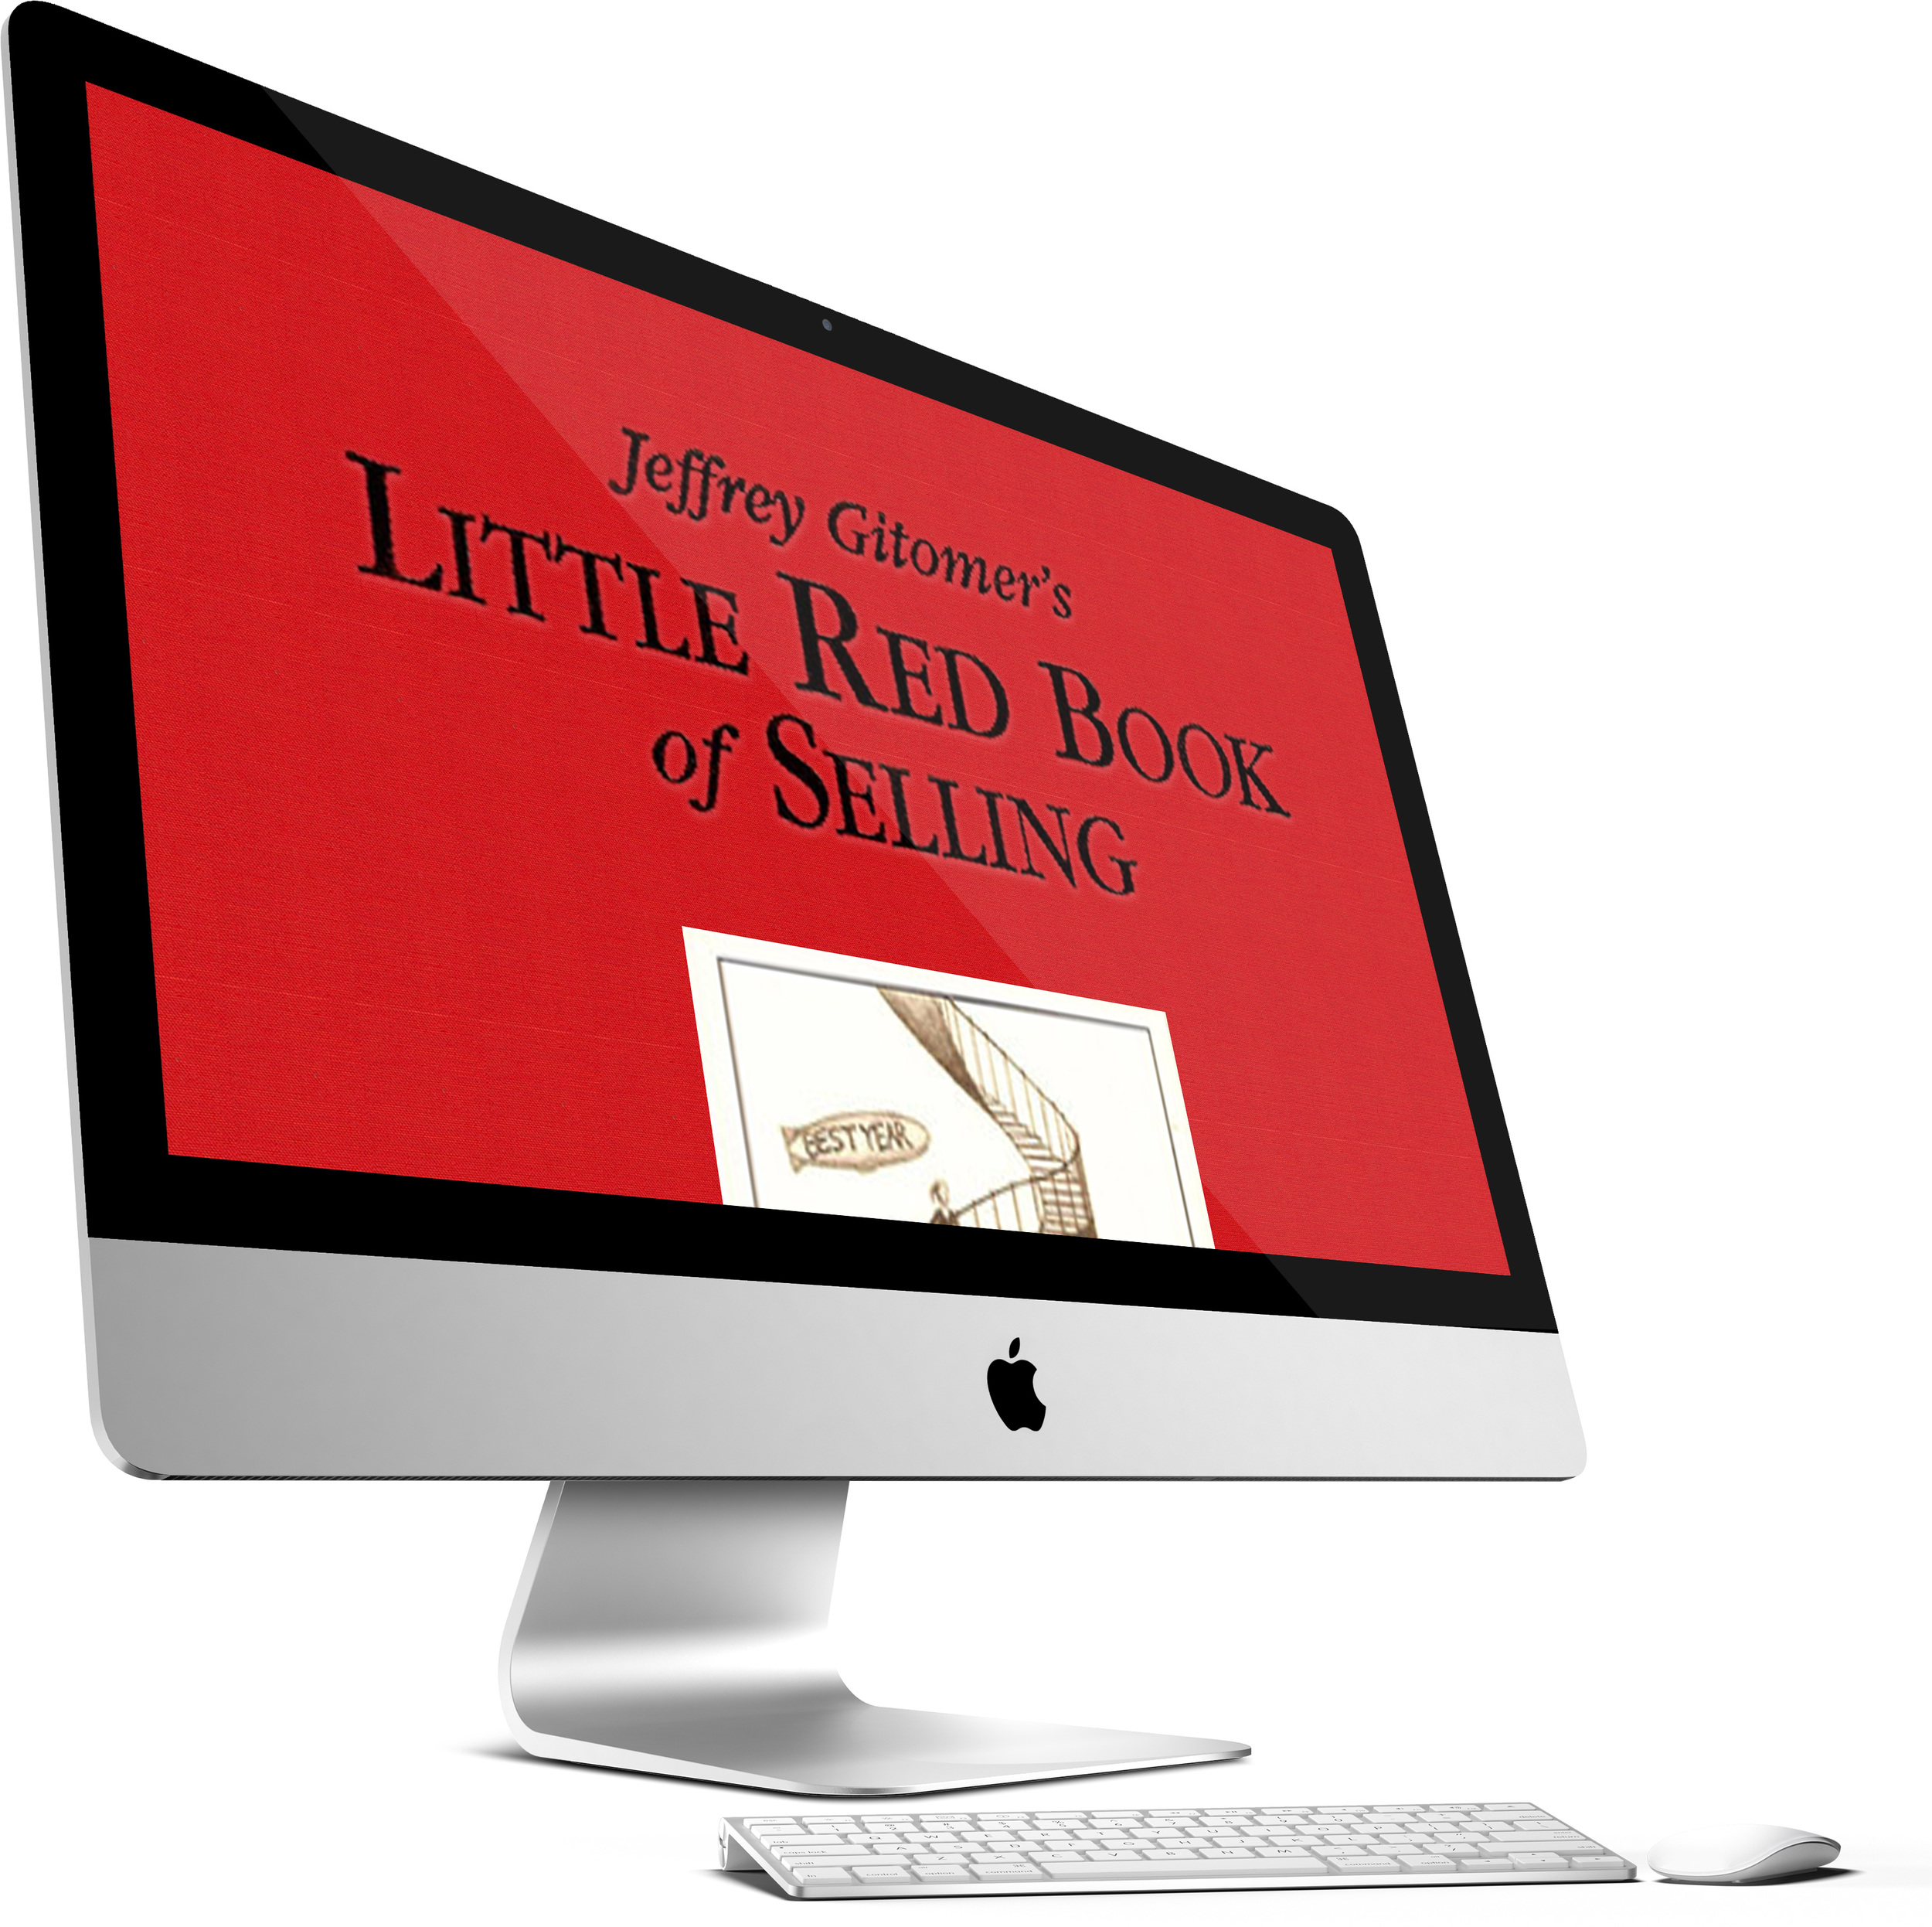 imac-little-red-book.jpg